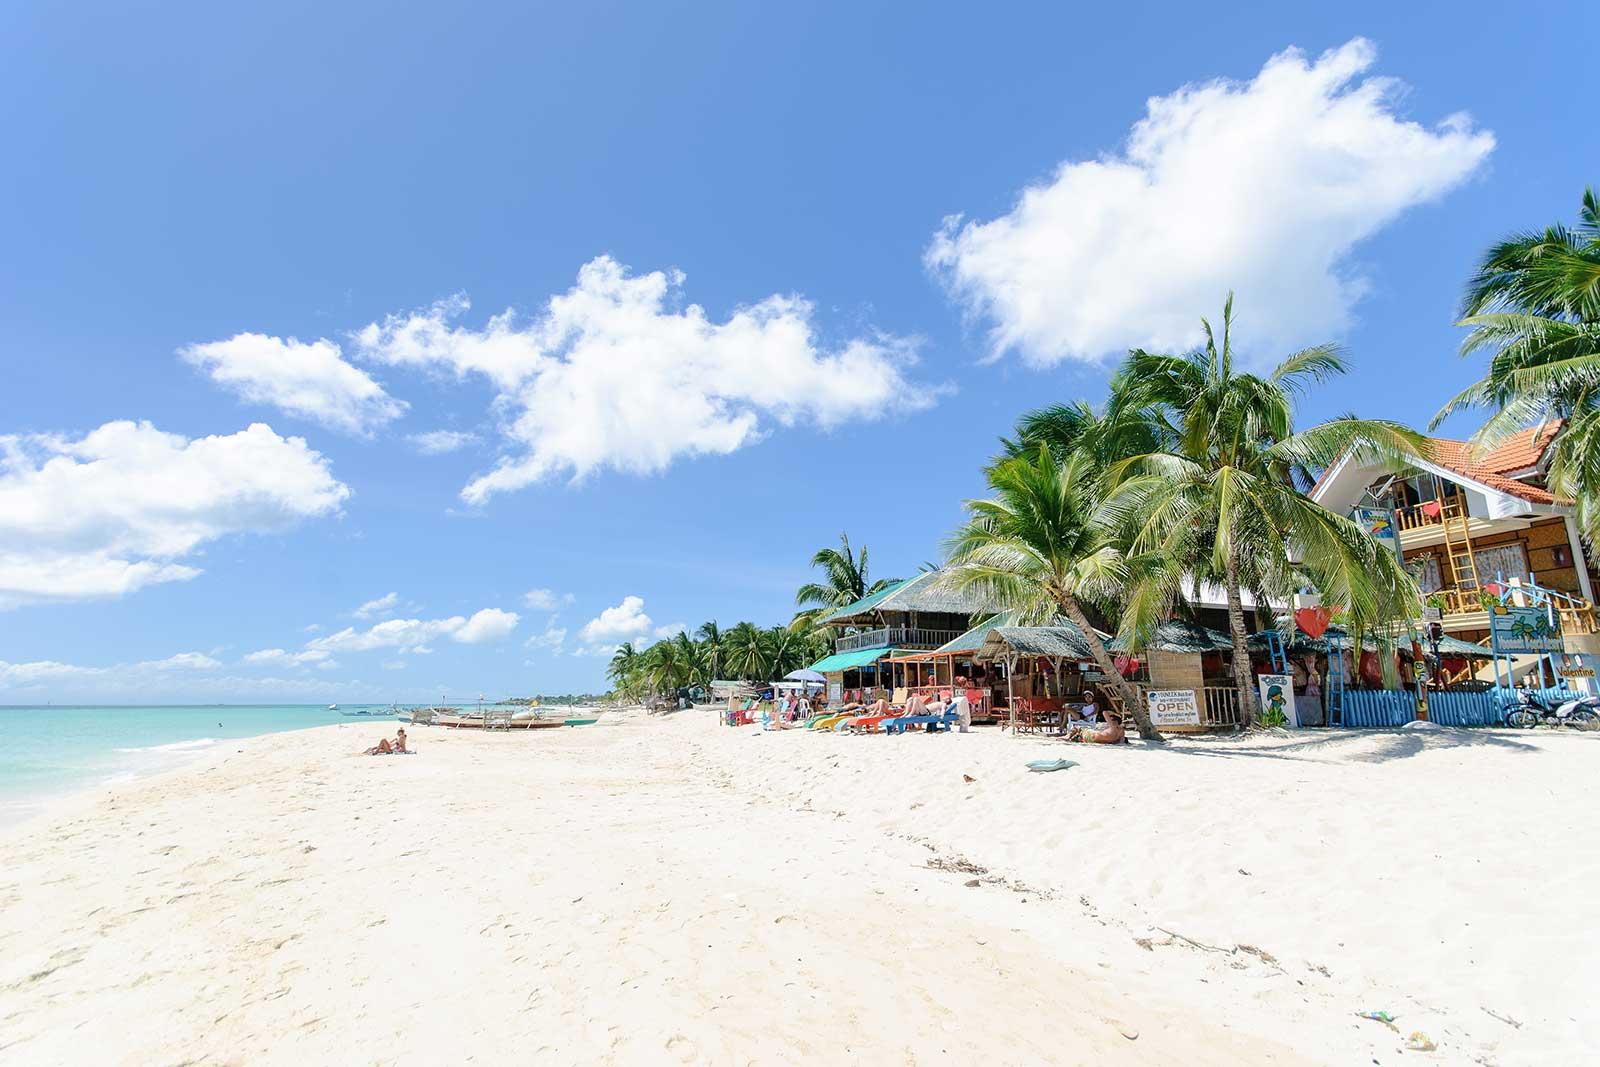 Yooneek Beach Resort, Sugar Beach, Bantayan Island